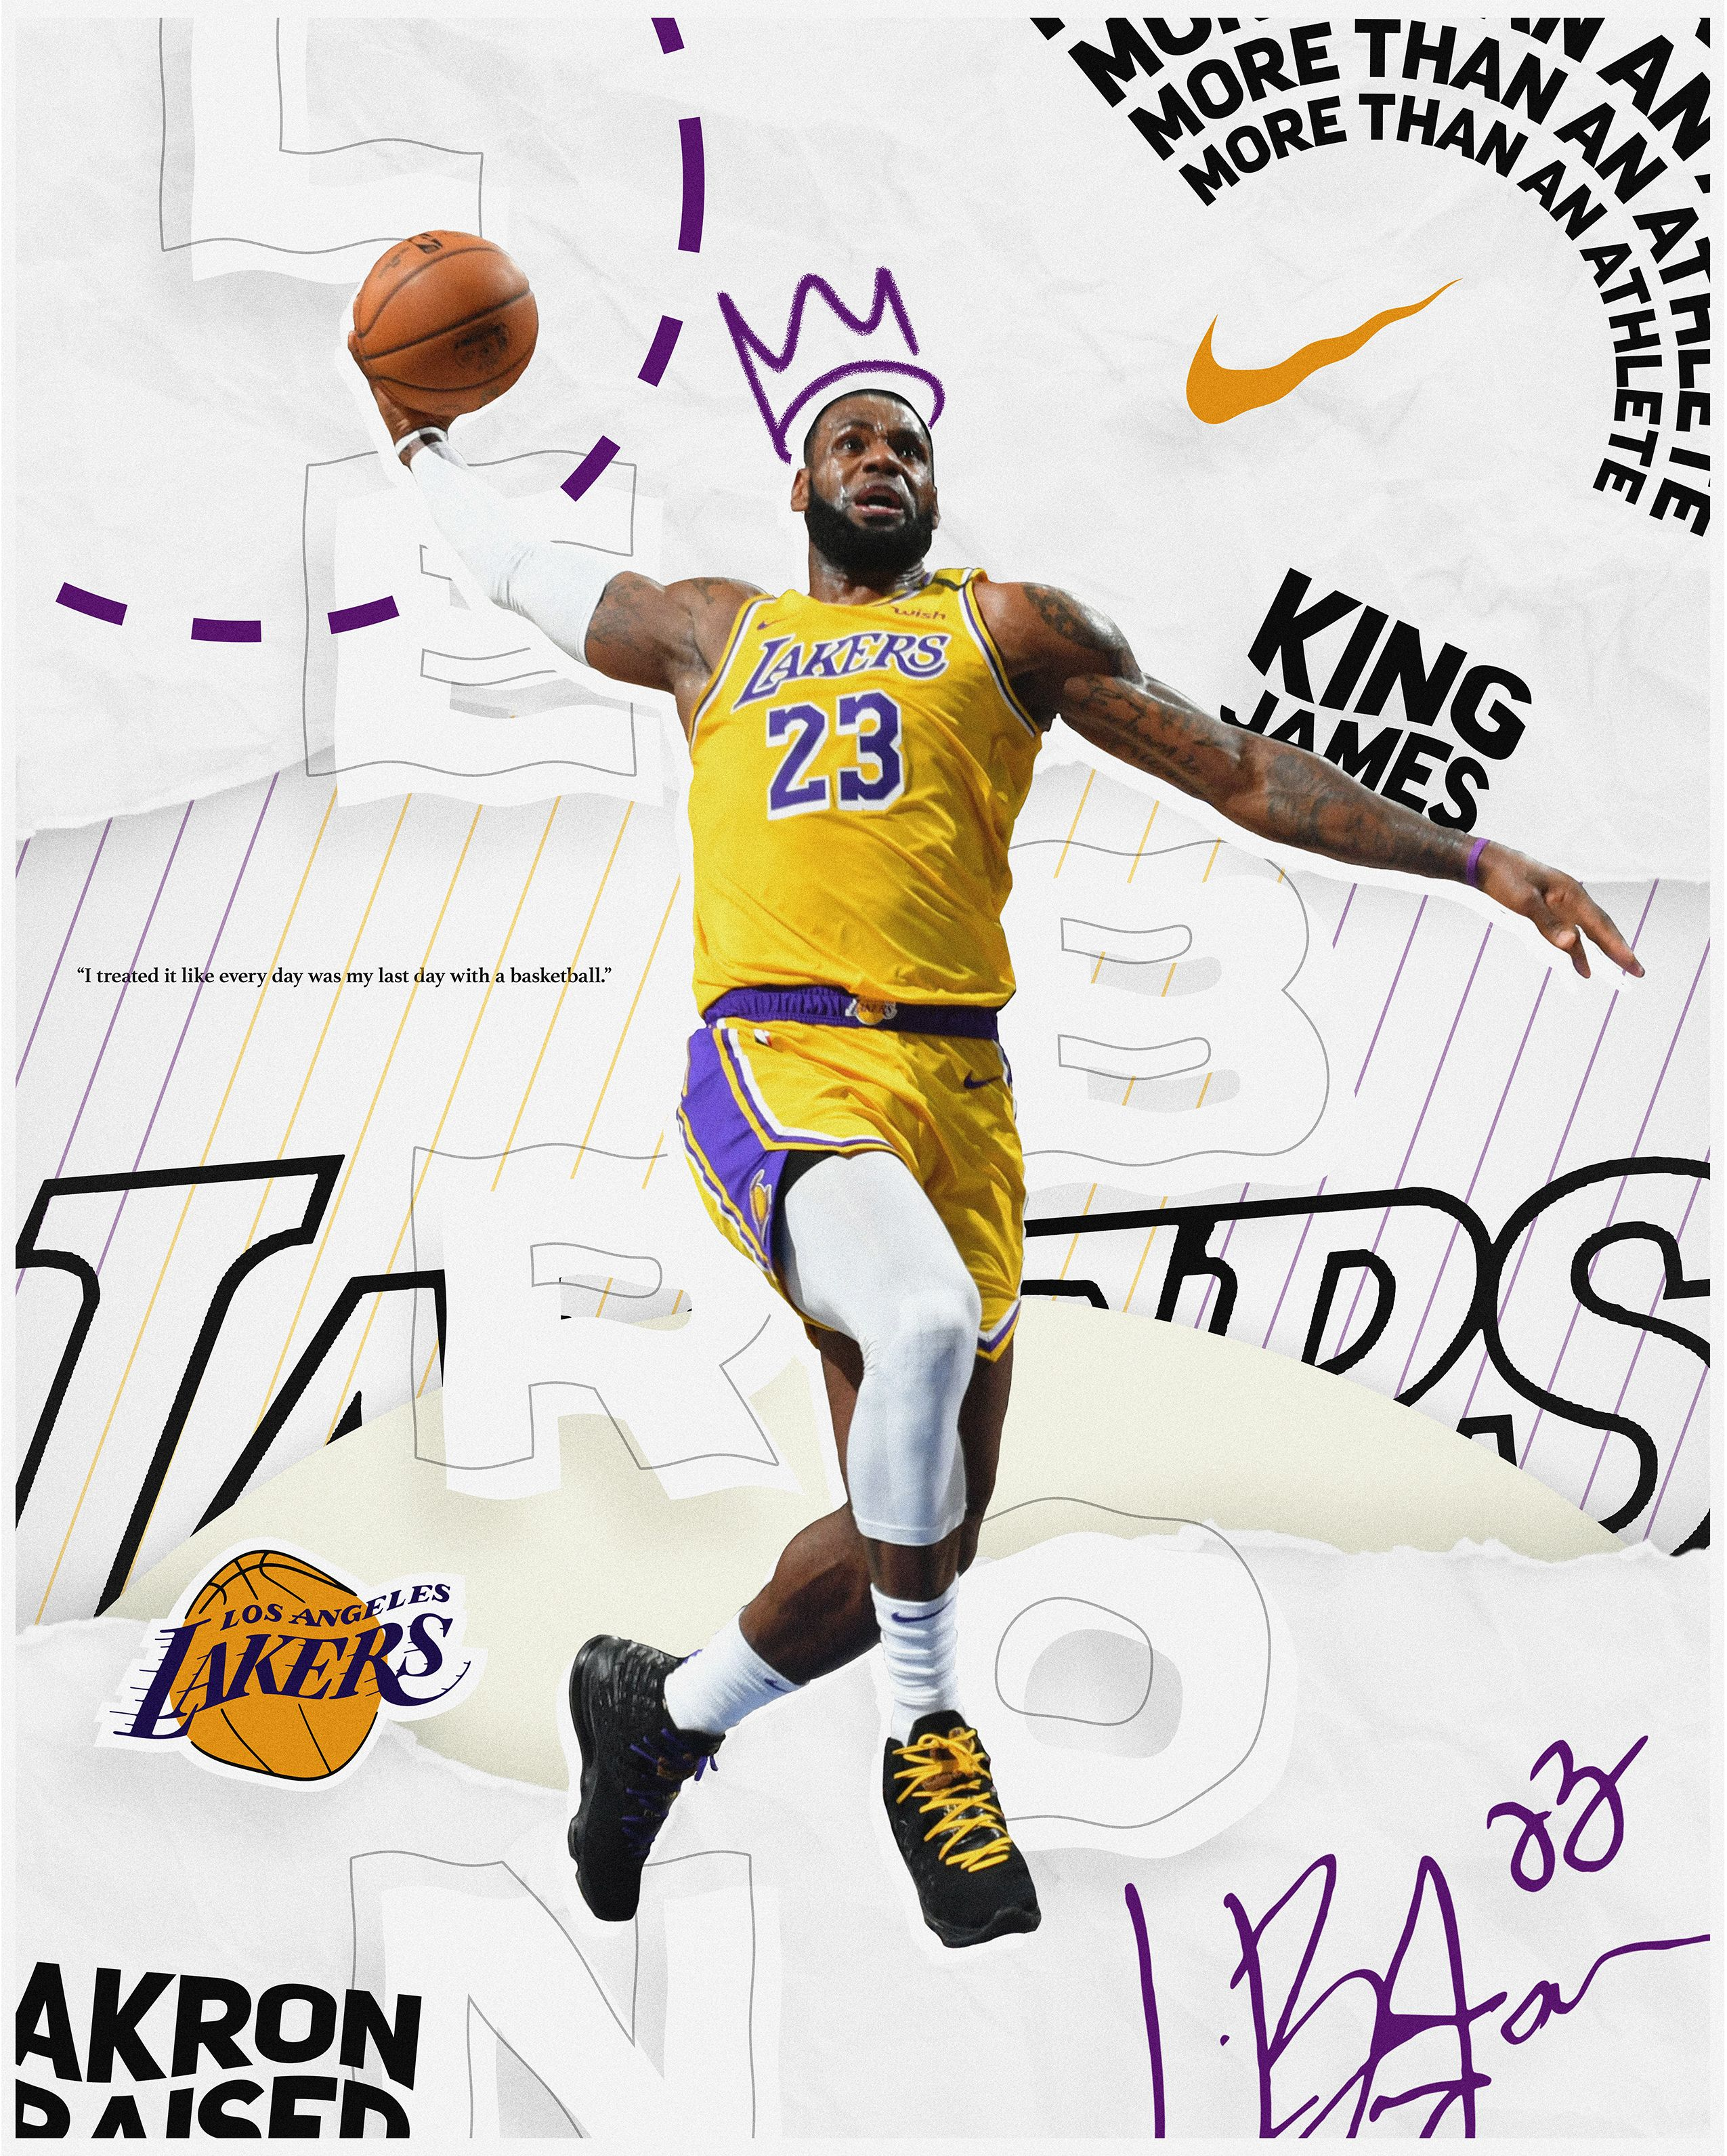 Lebron James X Los Angeles Lakers 2020 Nba Playoffs In 2020 Nba Playoffs Lebron James Nba